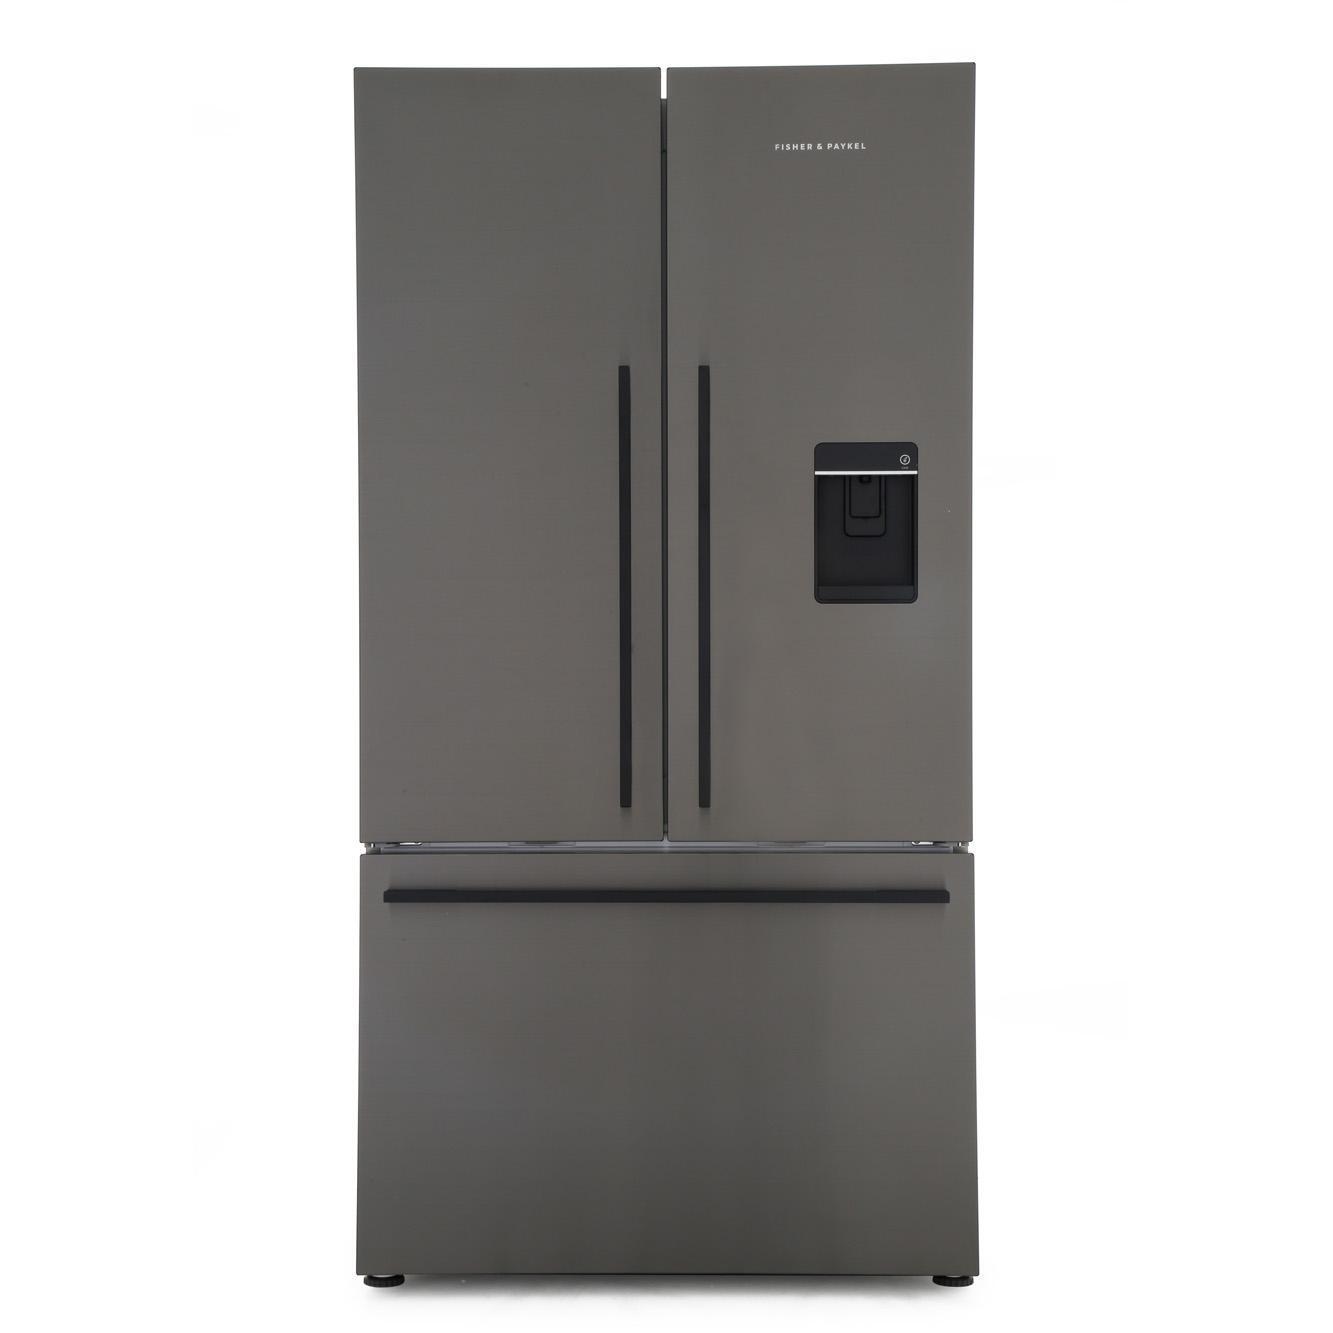 Fisher & Paykel RF540ADUB5 Designer American Fridge Freezer